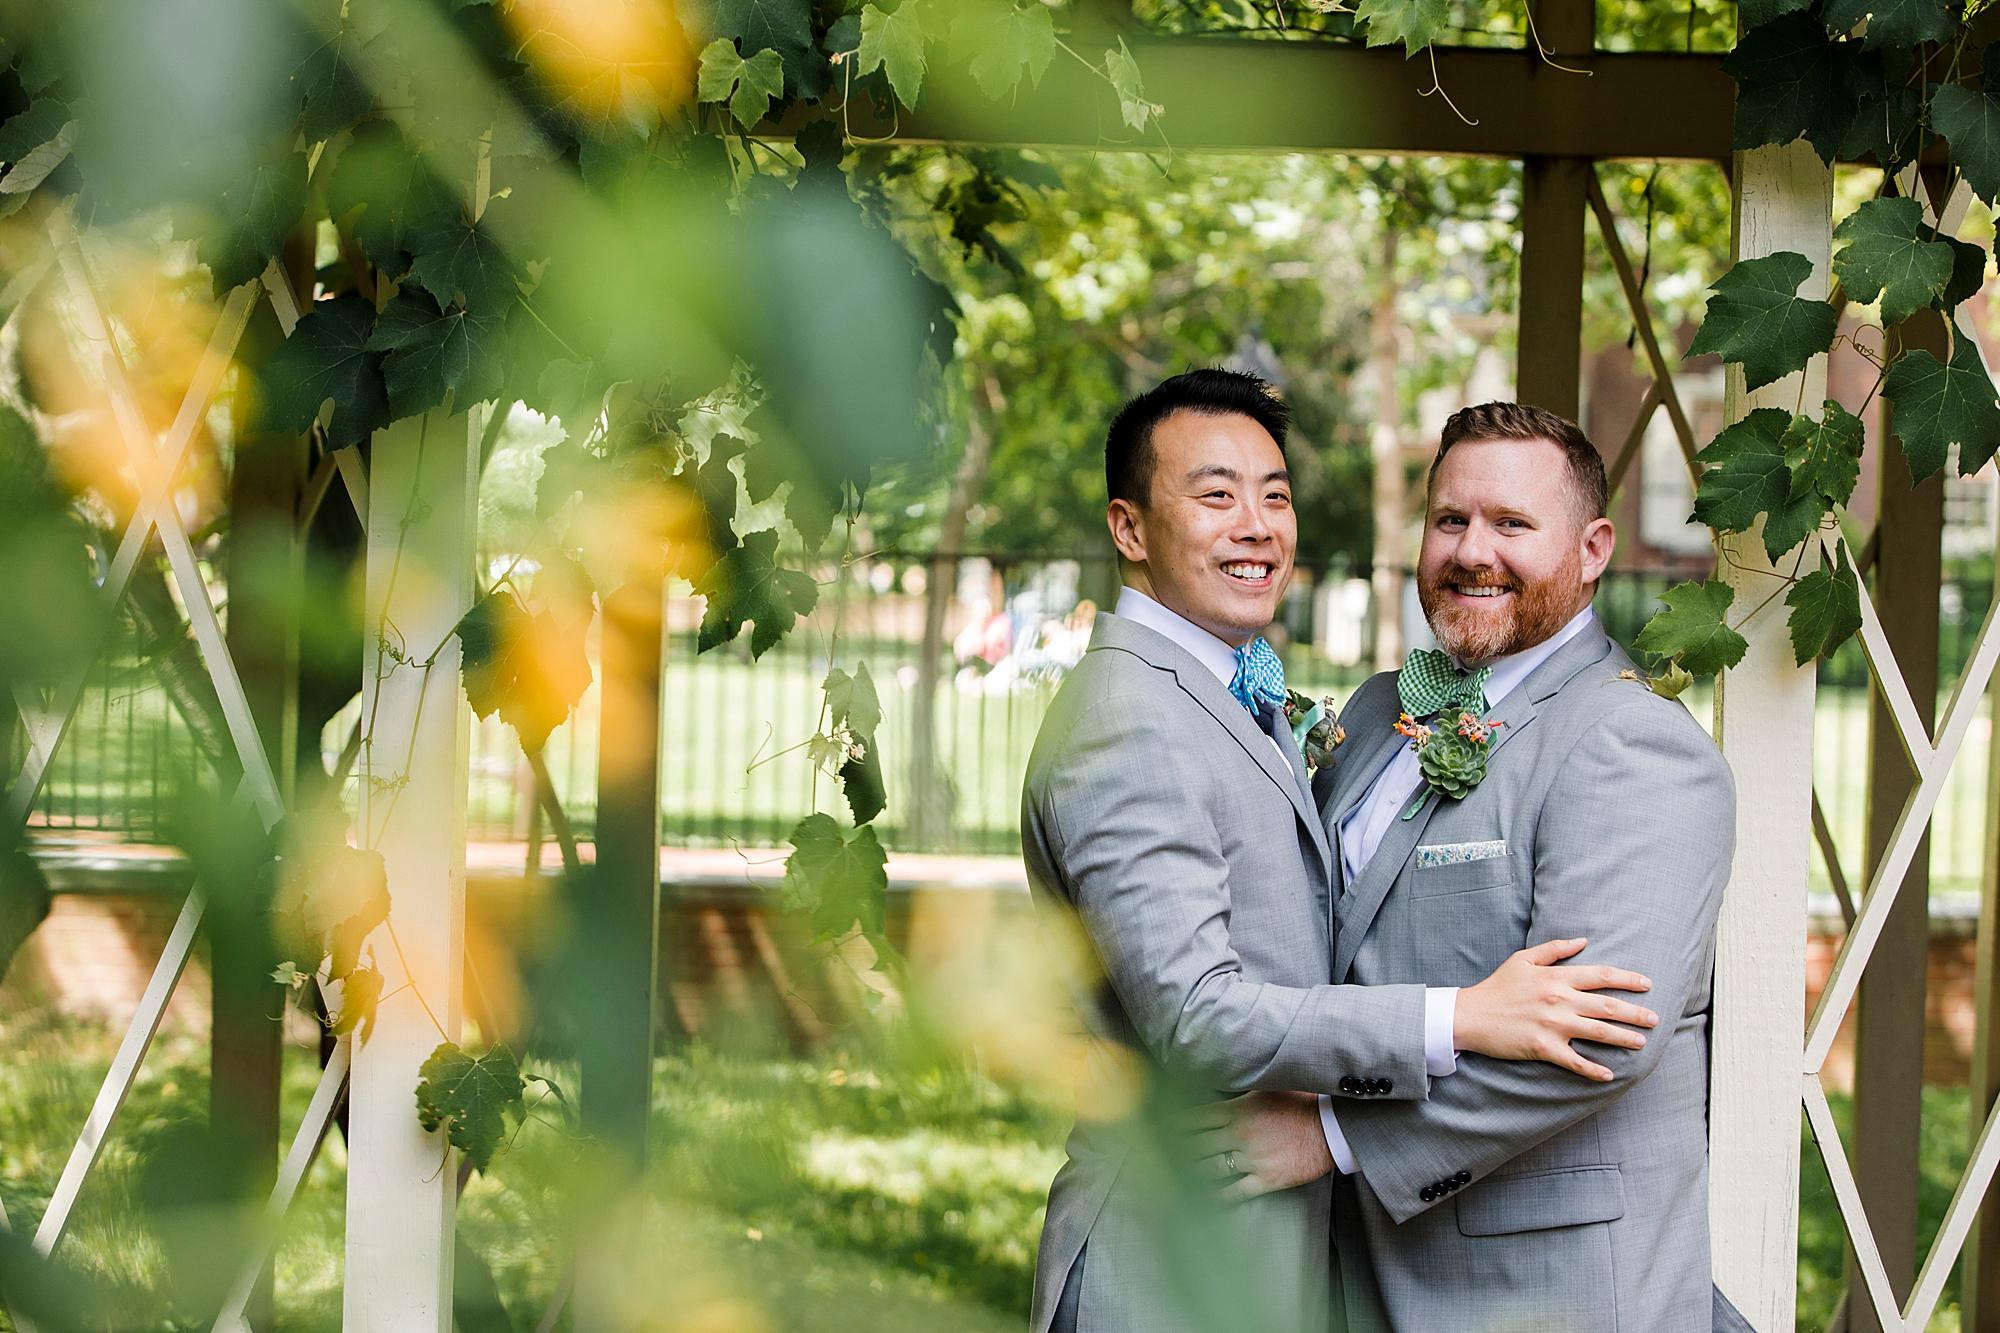 Dan_and_Byron_Love_by_Joe_Mac_Philadelphia_Wedding_LGBTQ_Photography_Gay_Independence_visitor_Center_31.JPG